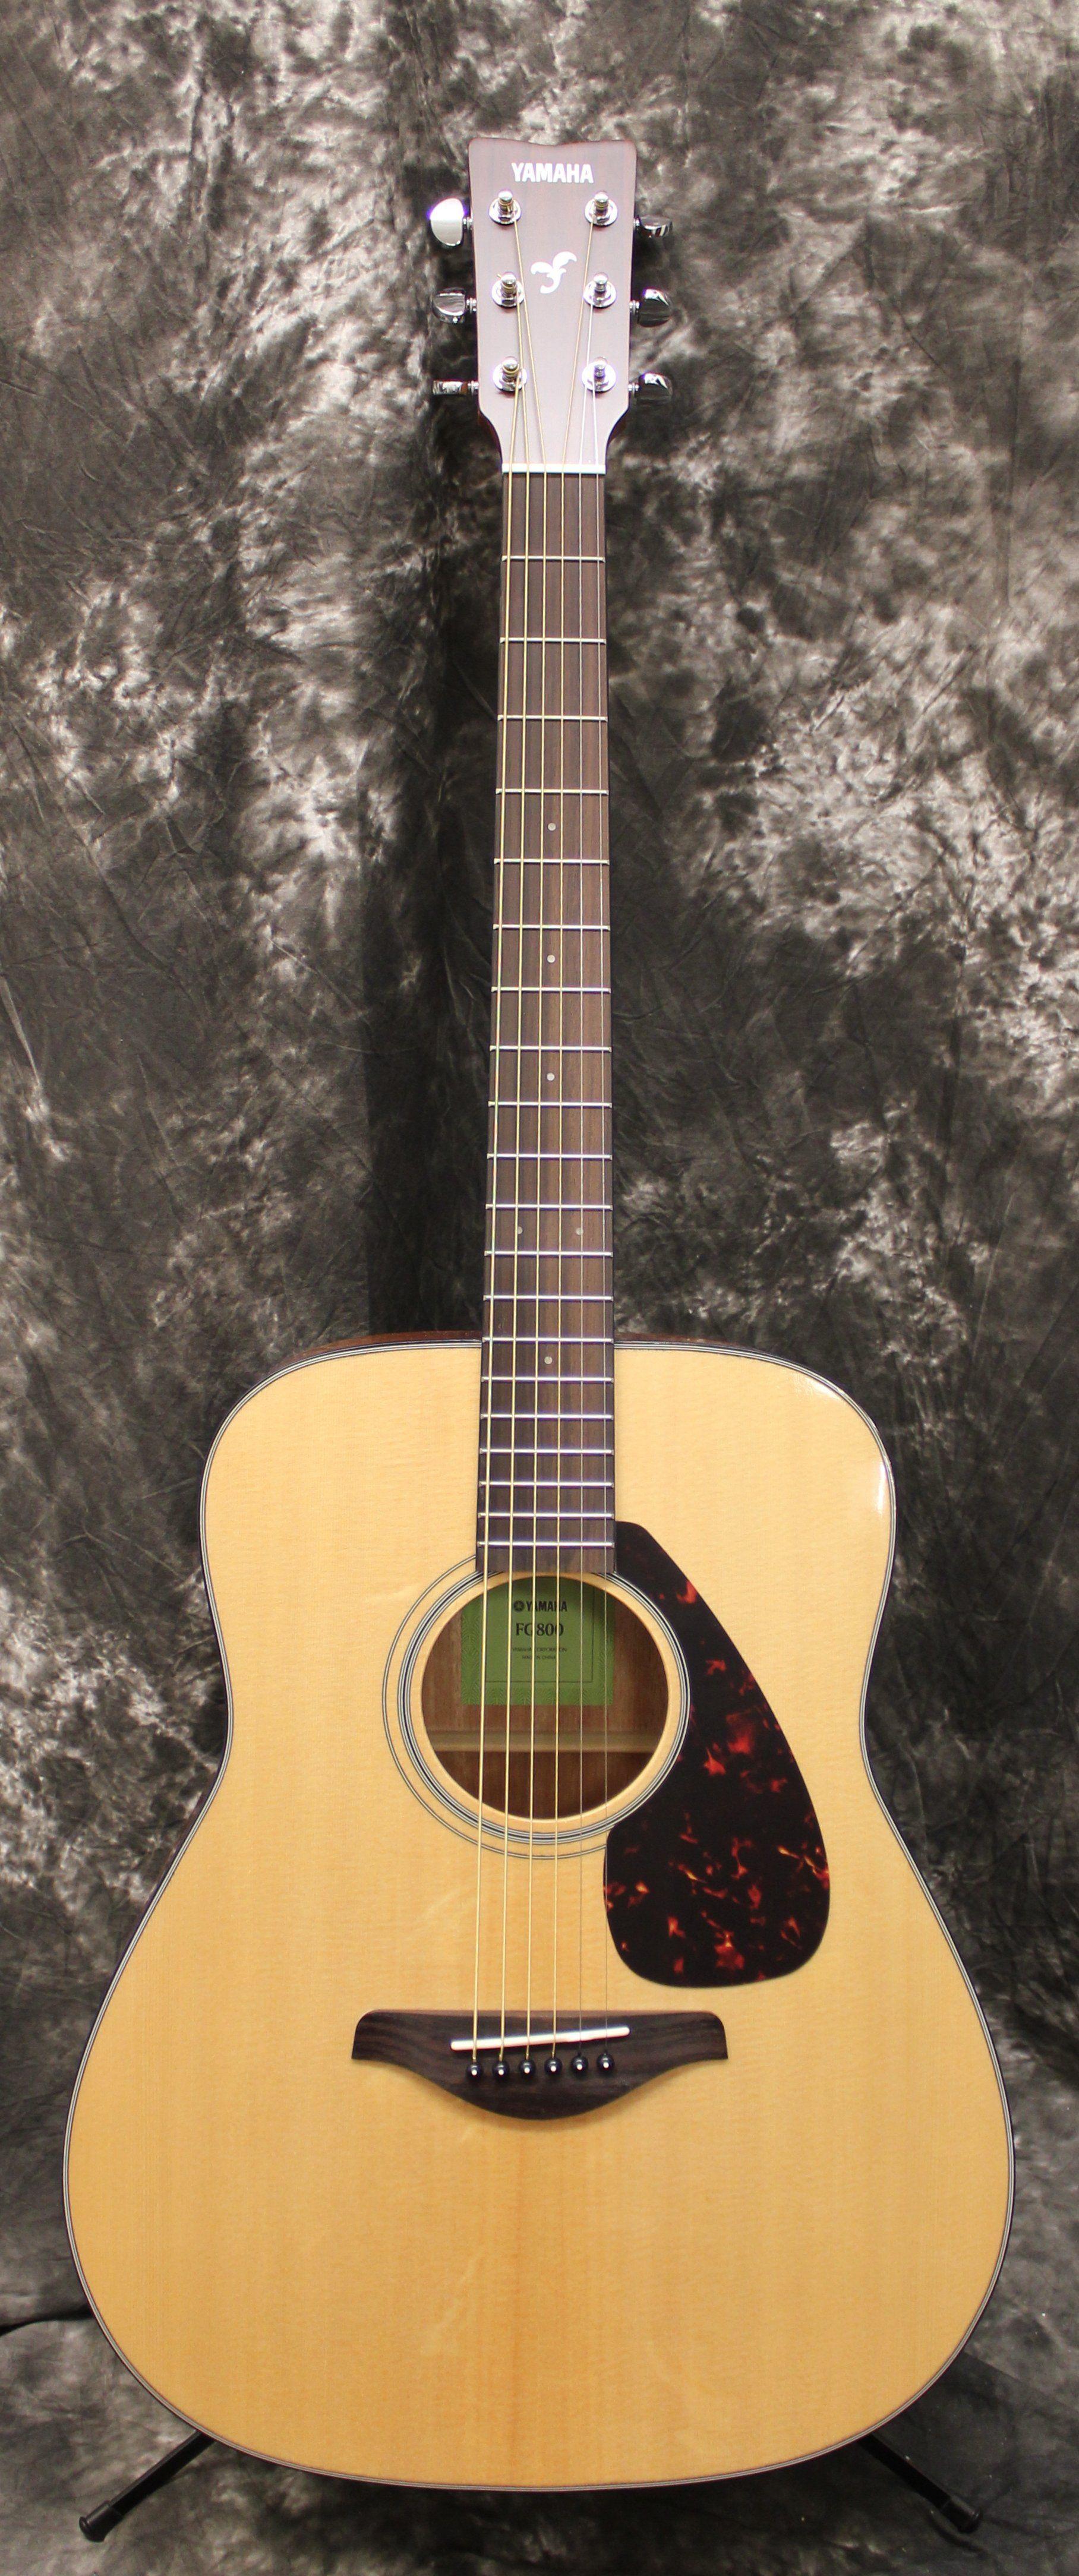 Yamaha Fg800 Folk Acoustic Guitar Acoustic Electric Acoustic Electric Guitar Guitar